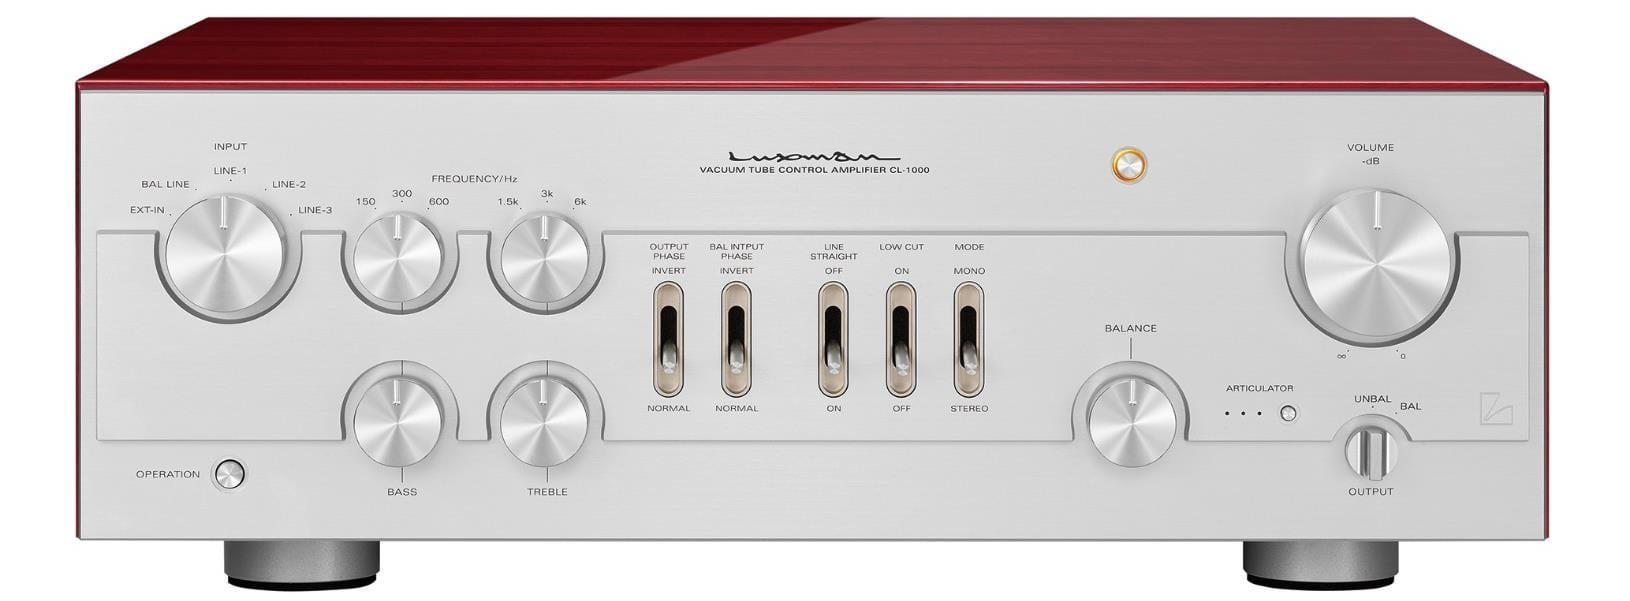 Luxman Open House with Audio by Mark Jones